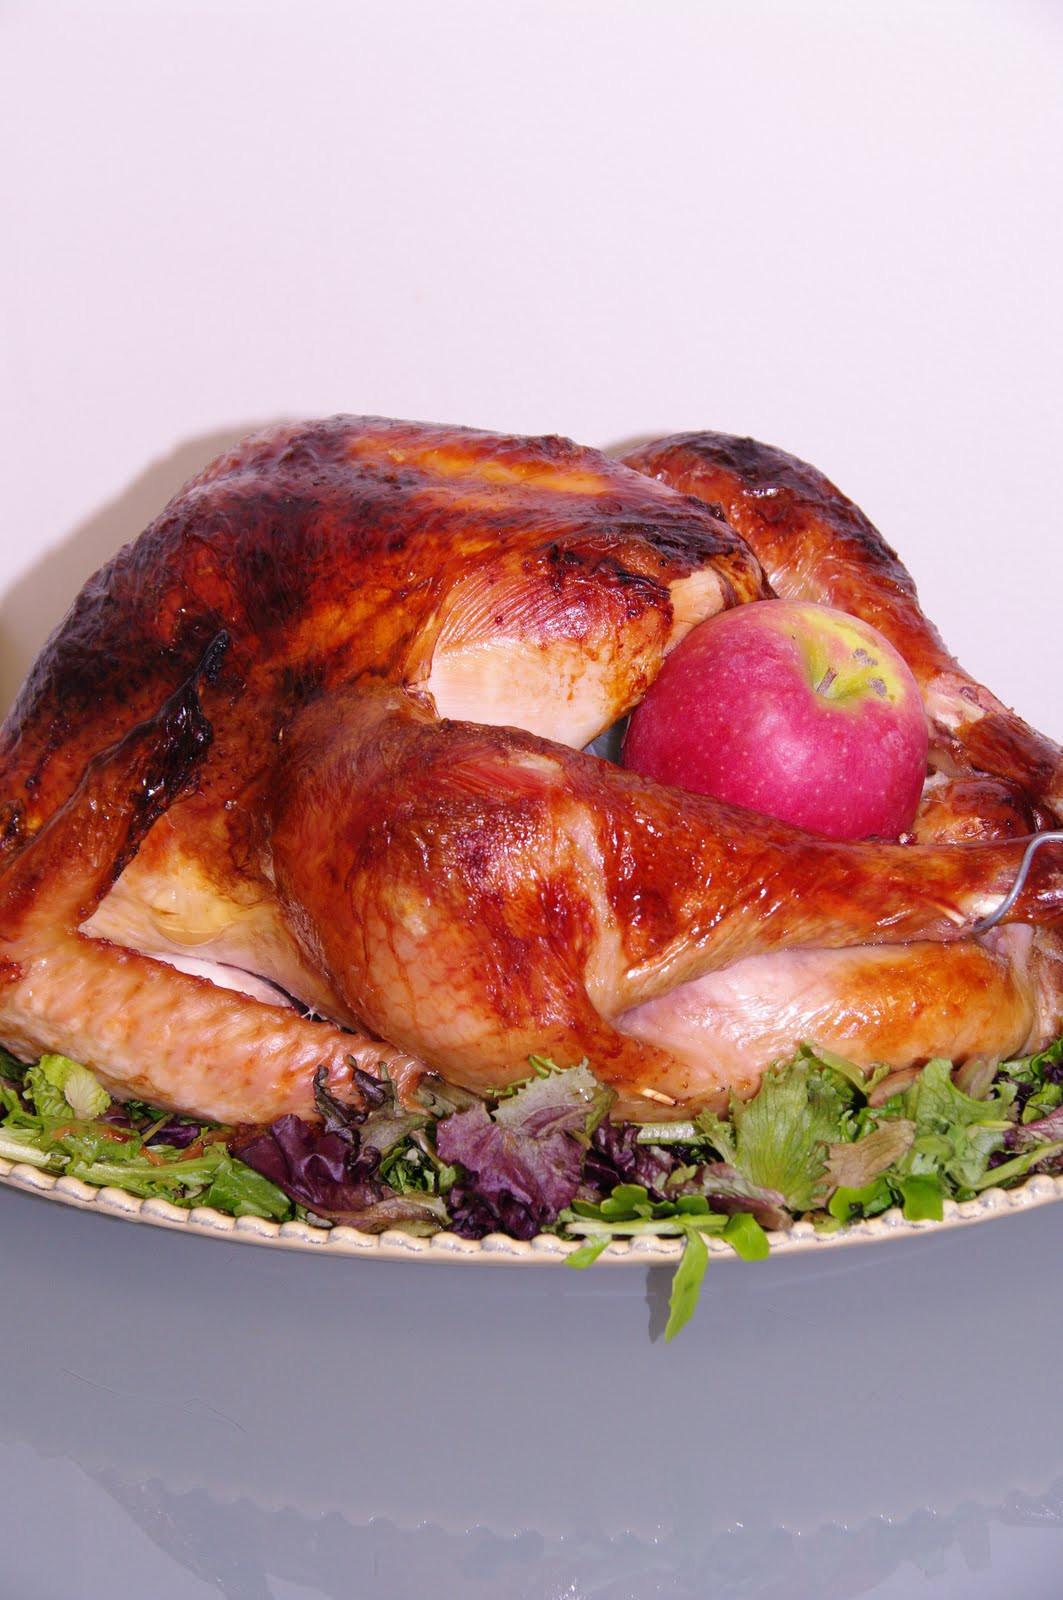 Alton Brown Thanksgiving Turkey  A Blog About Food Alton Brown s Roast Turkey